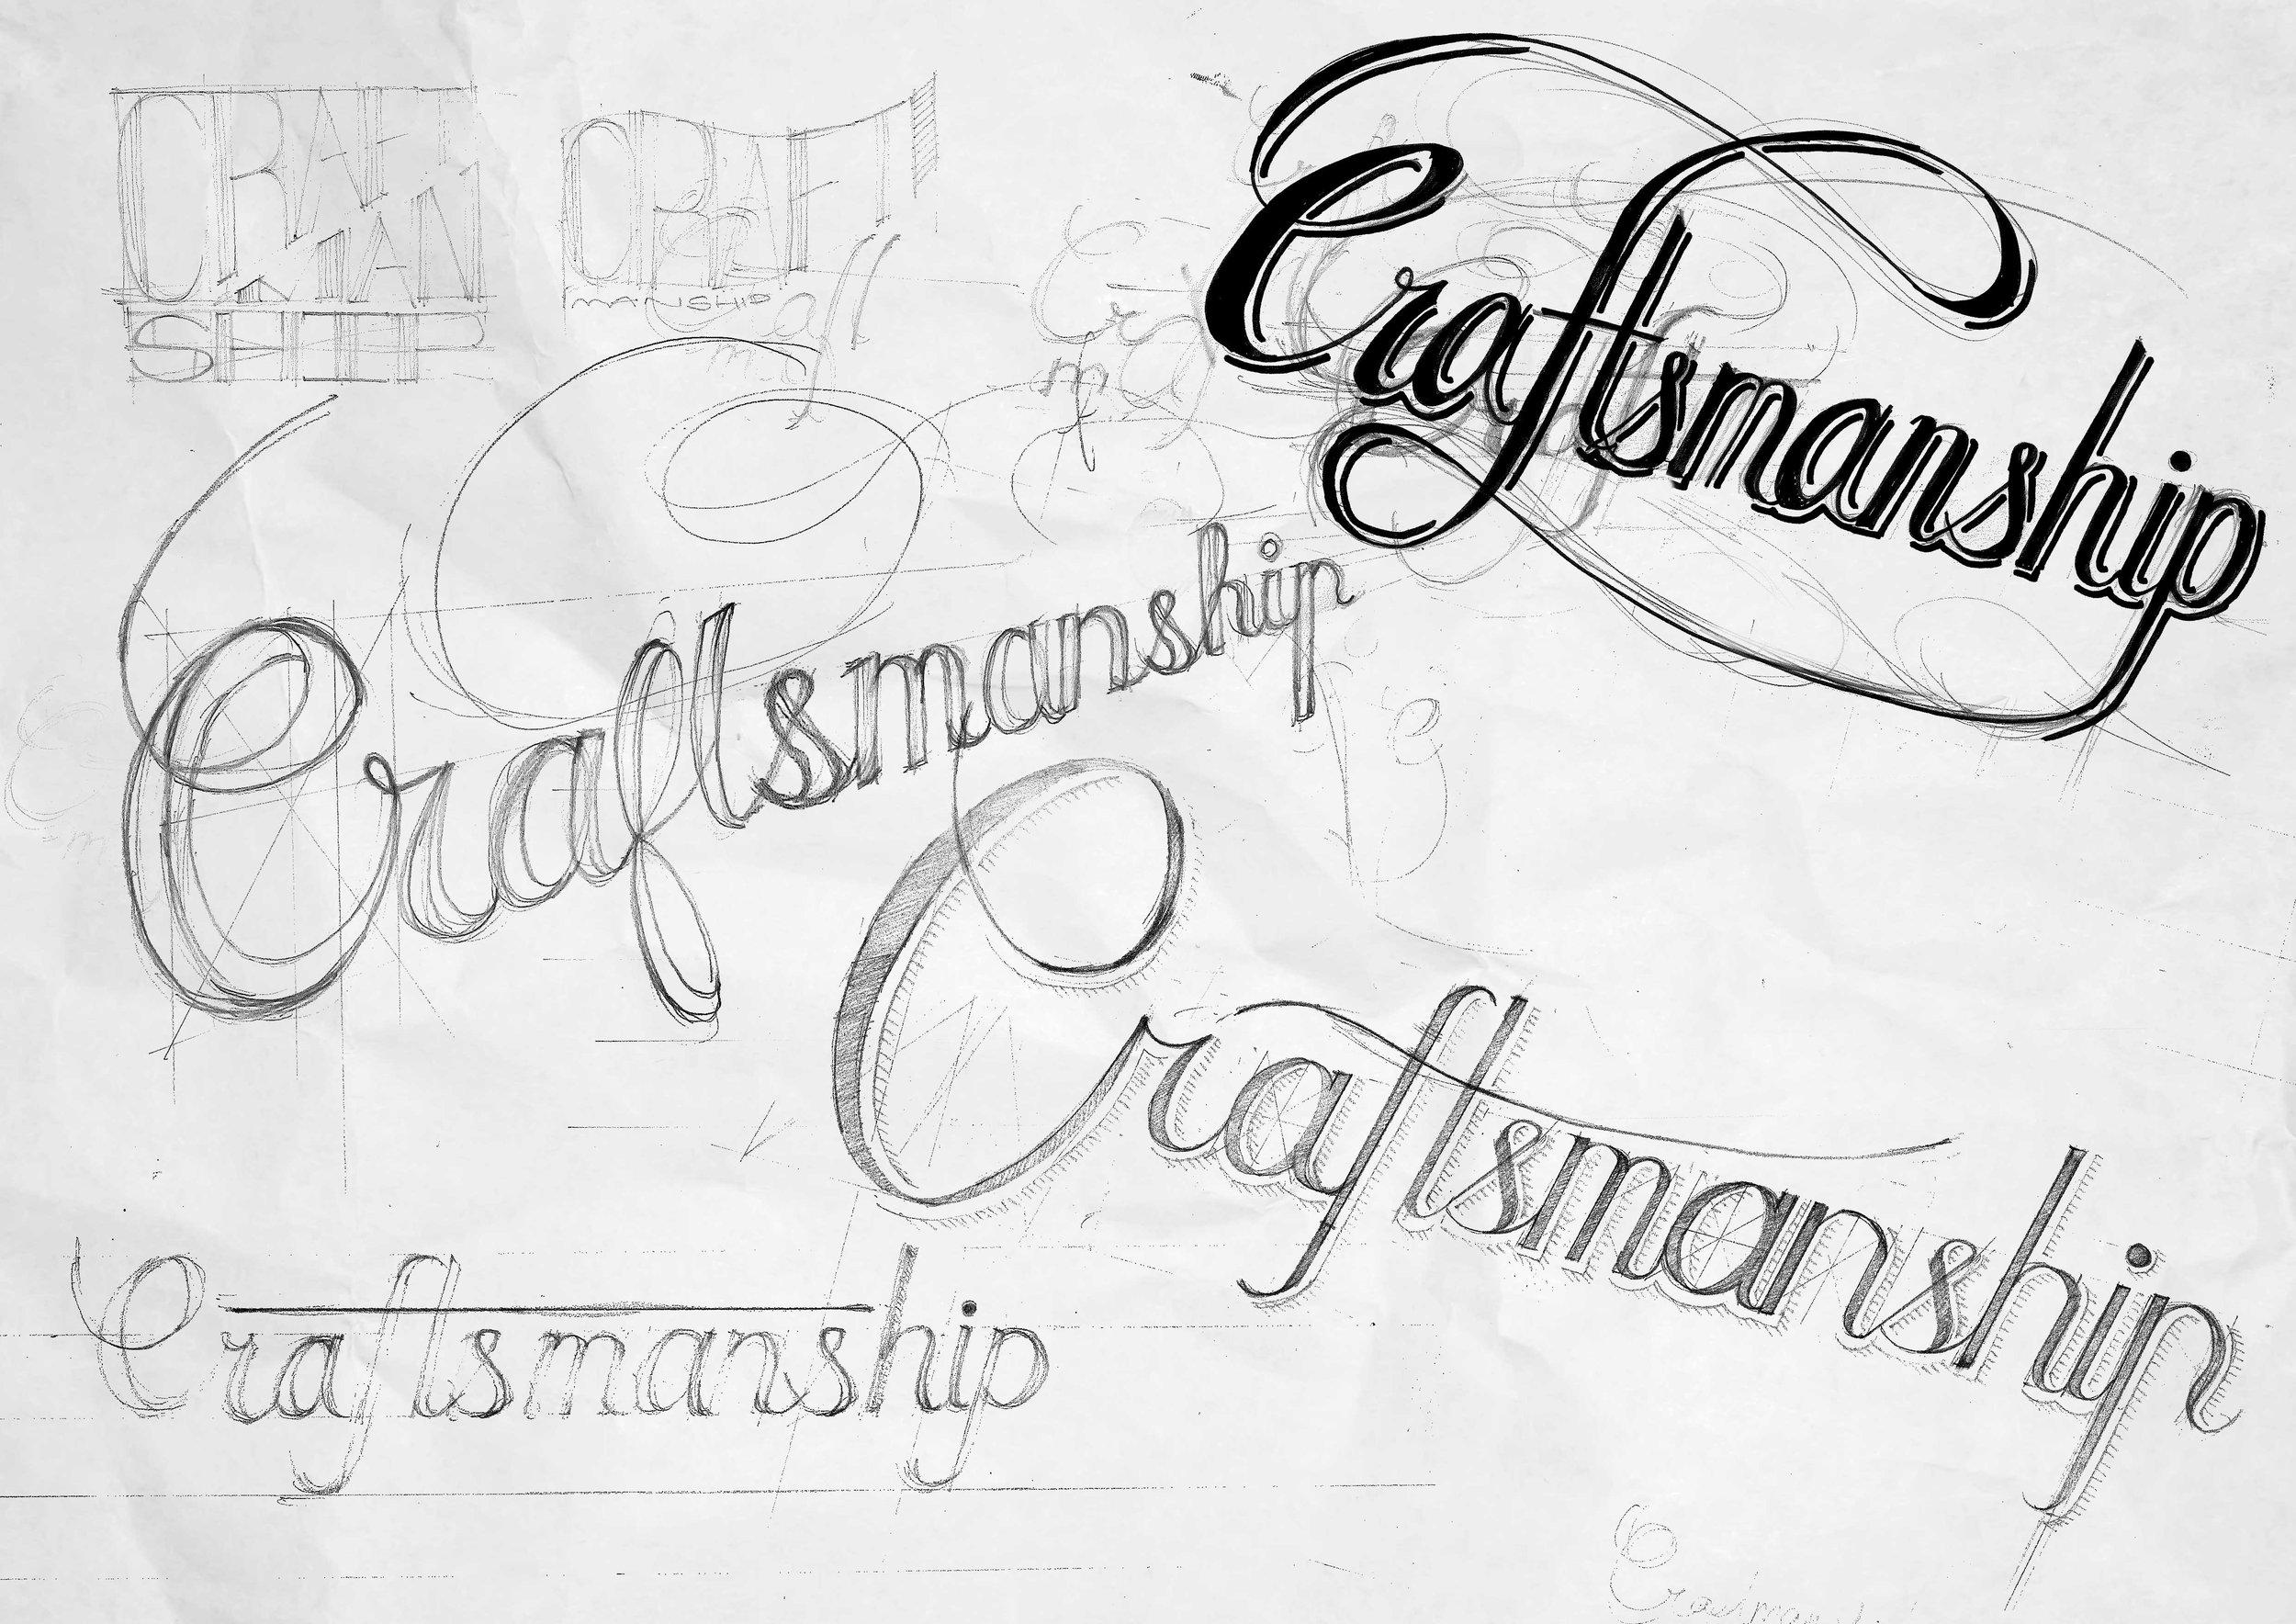 Craftsmanship-Working1.jpg